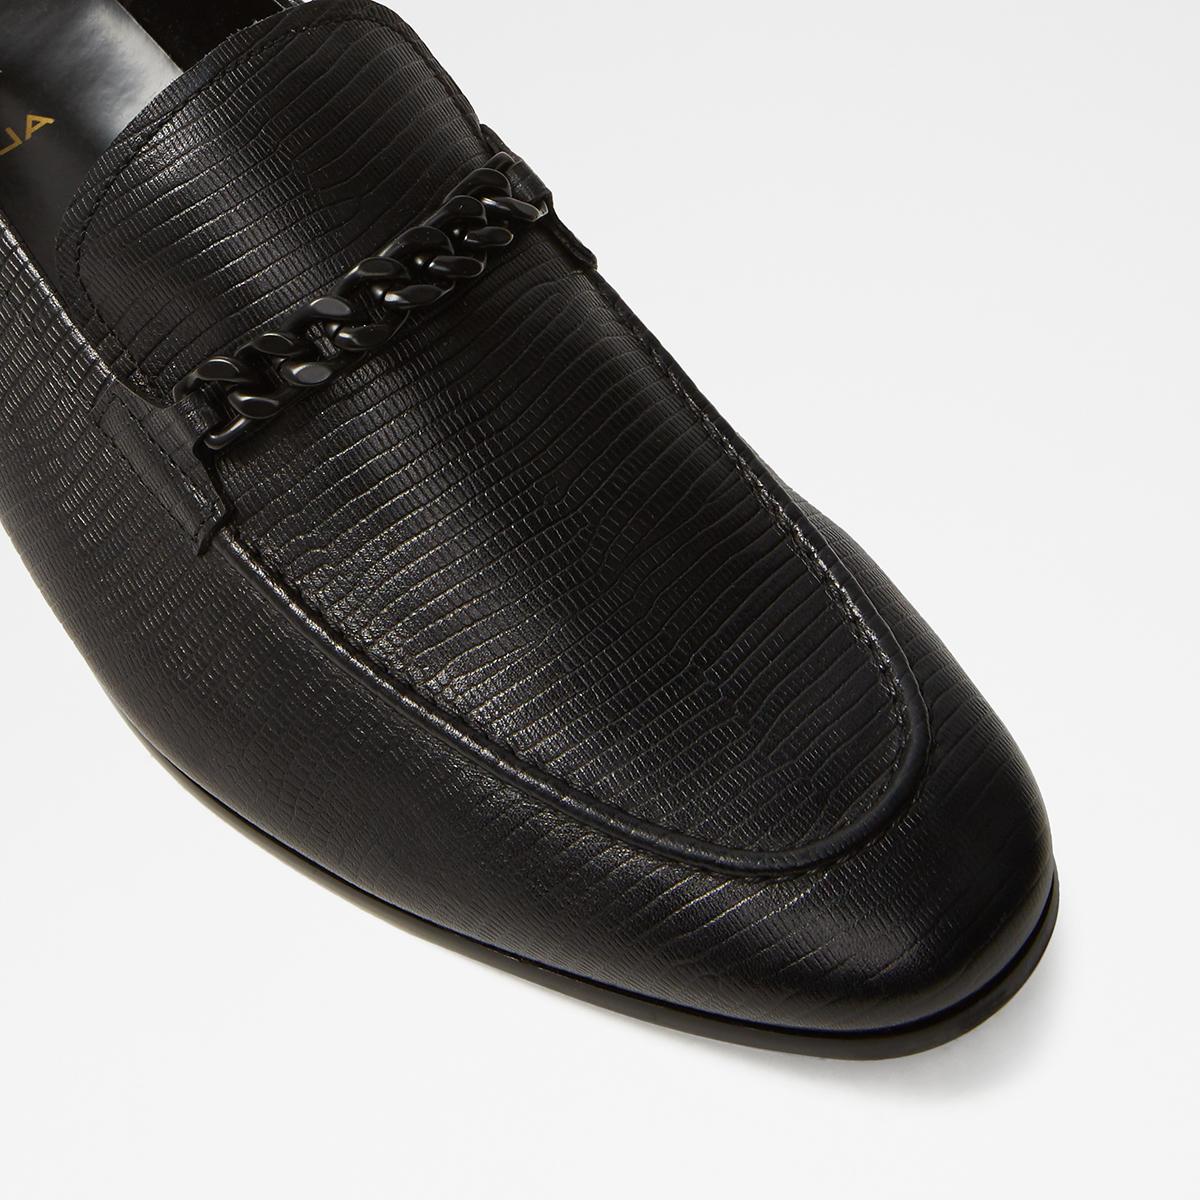 038ae4d20ed Royton Midnight Black Men s Loafers